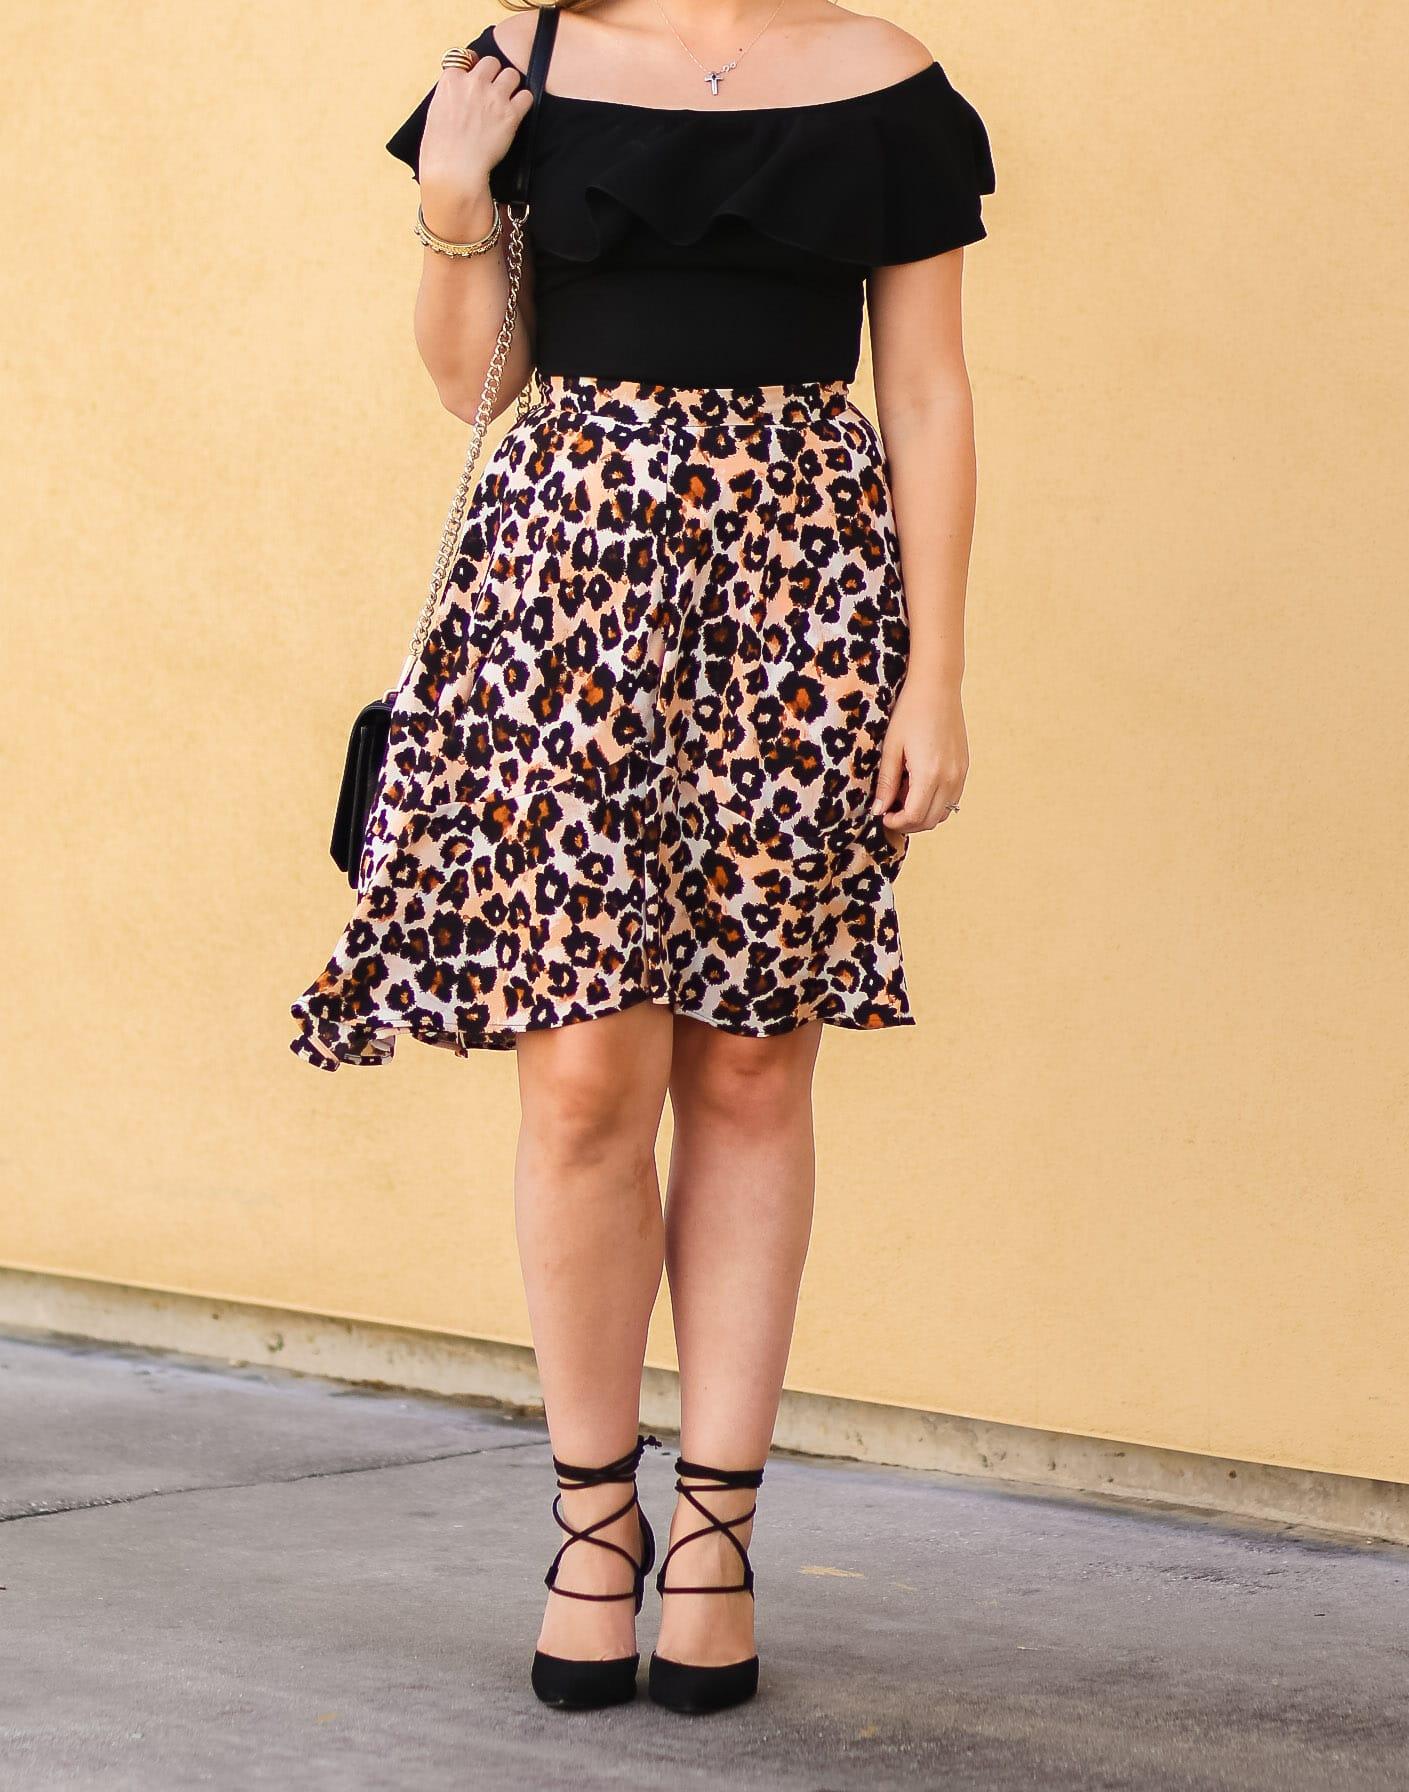 leopard-print-skirt-1015